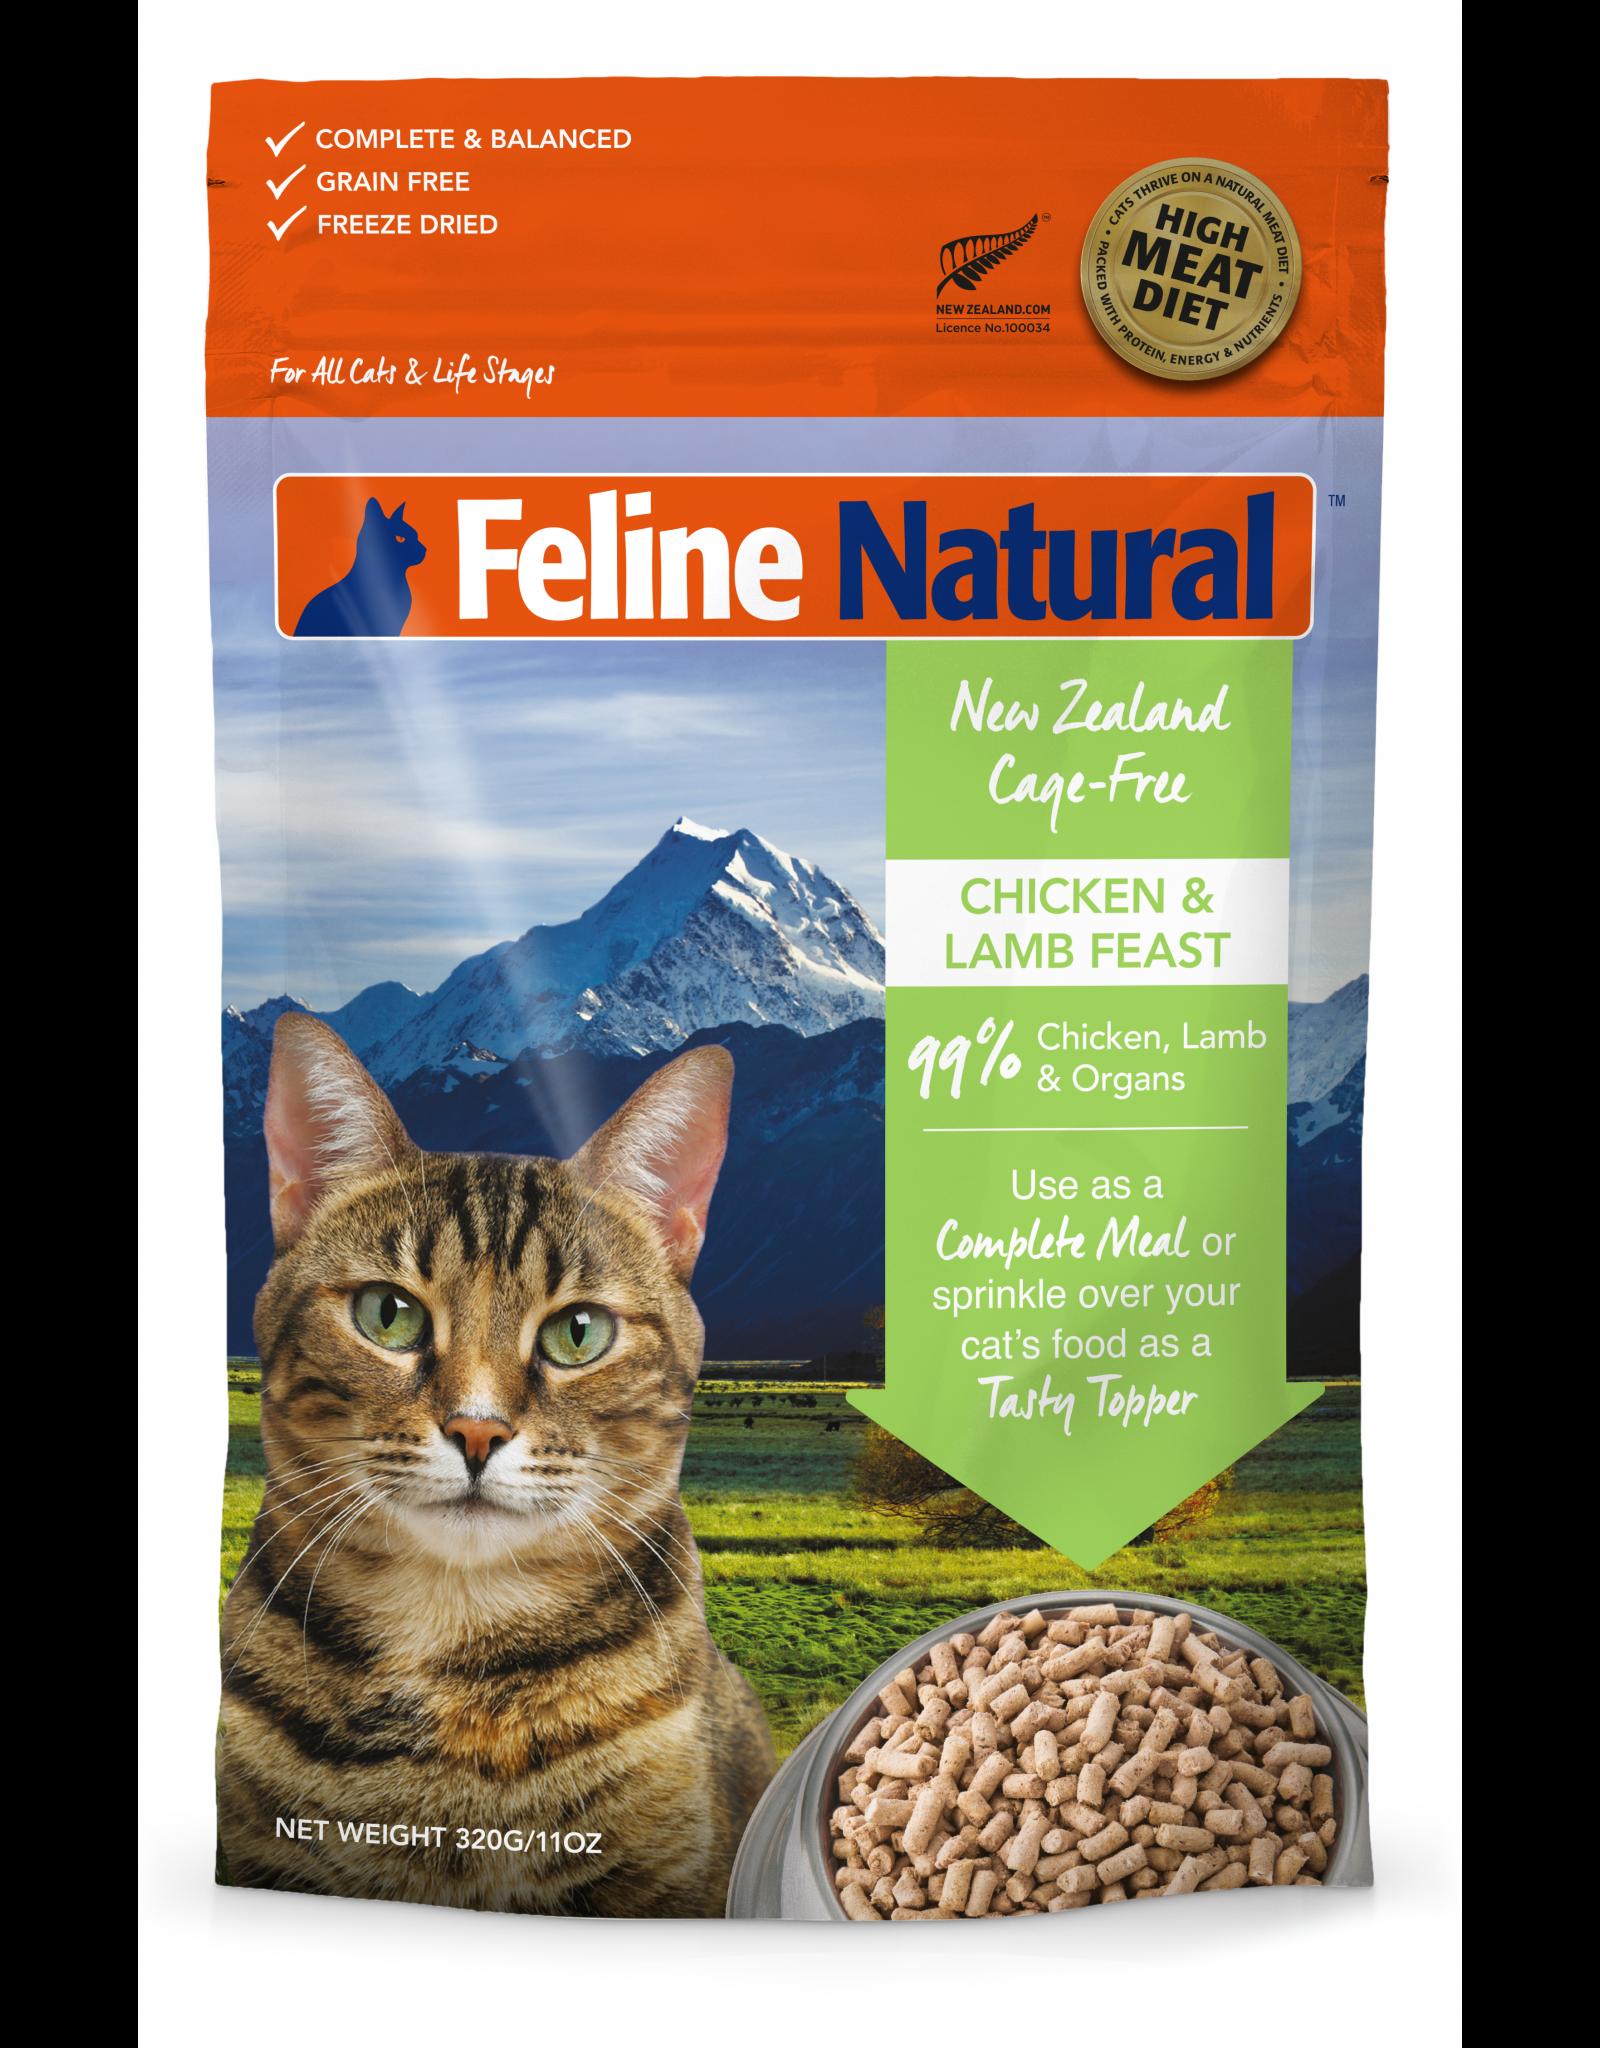 K9 Natural Feline Natural Chicken & Lamb Feast 6oz